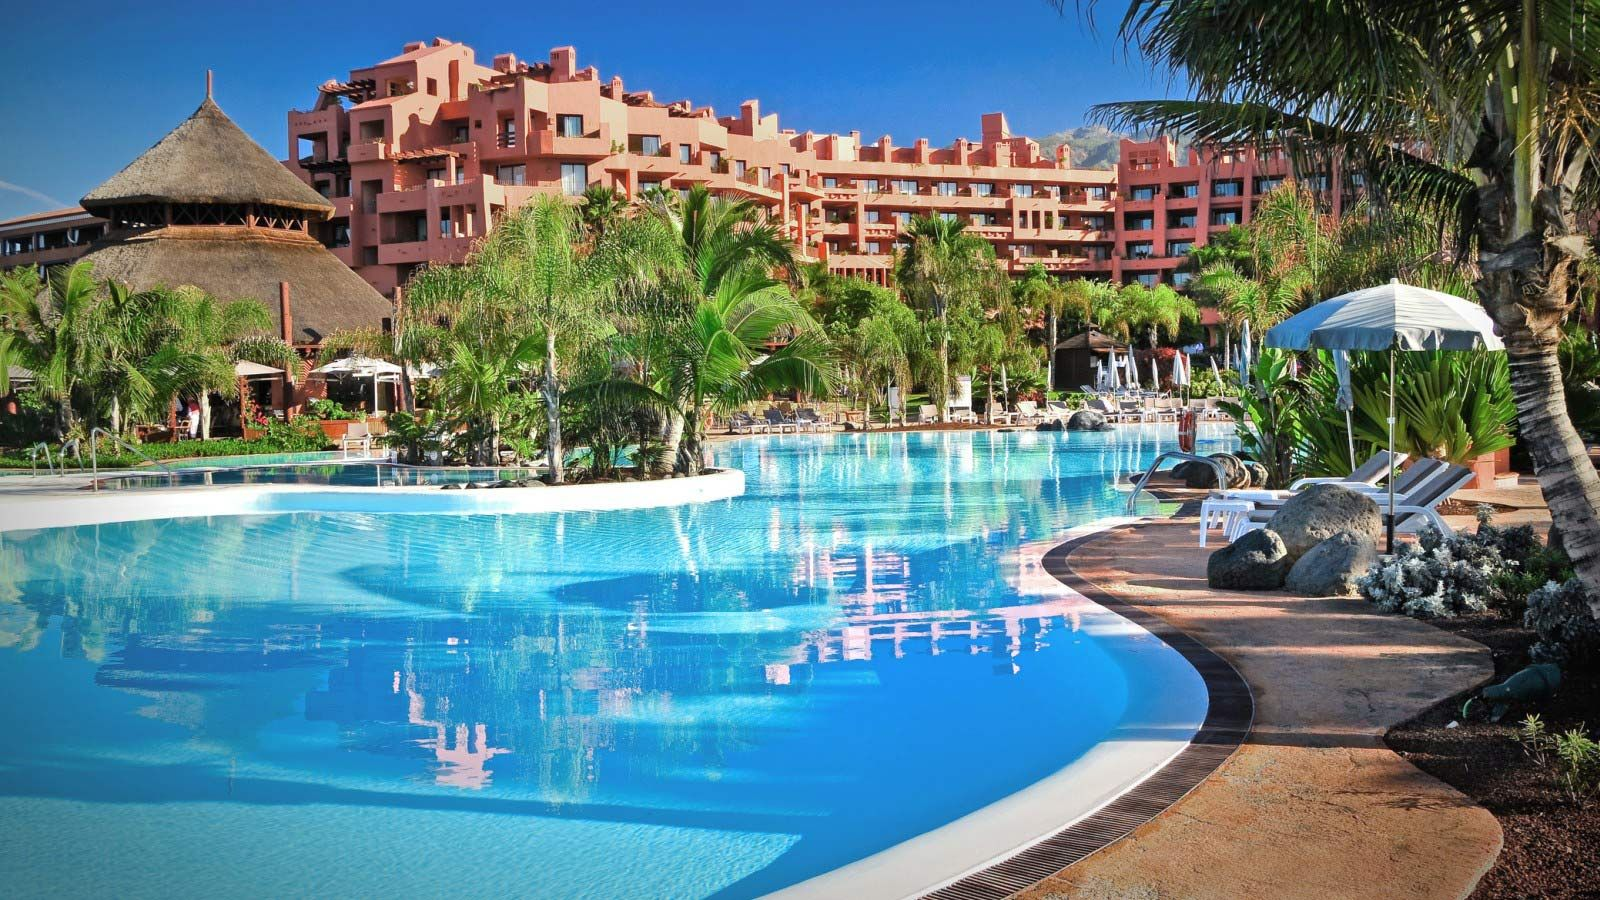 Sheraton La Caleta Photos Tenerife, Resort, Resort spa